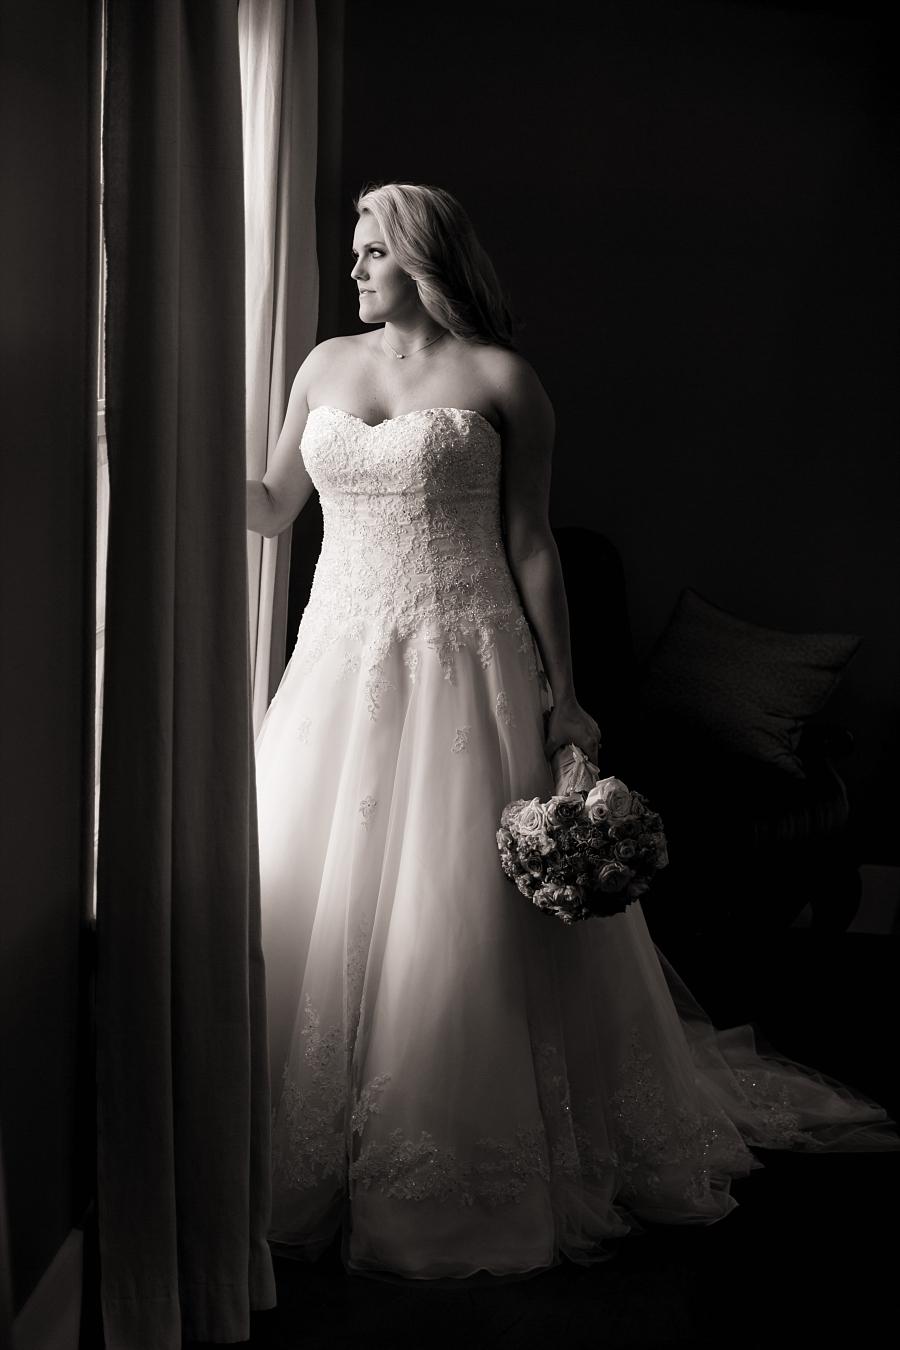 Stacy-Anderson-Photography-Balmorhea-Tomball-Wedding-Photographer_0001.jpg